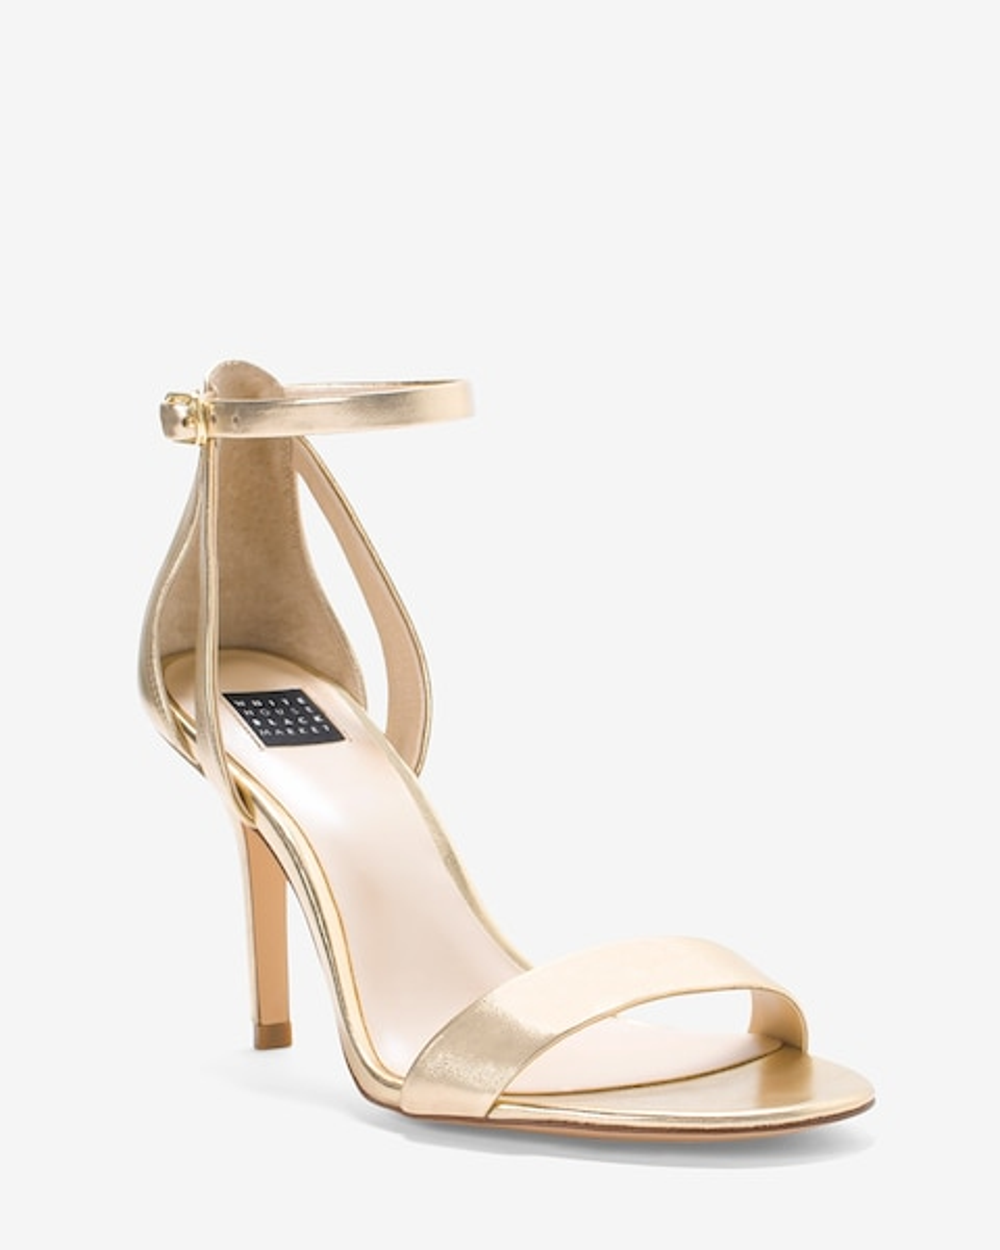 Gold Strappy Mid-Heel Sandals - White